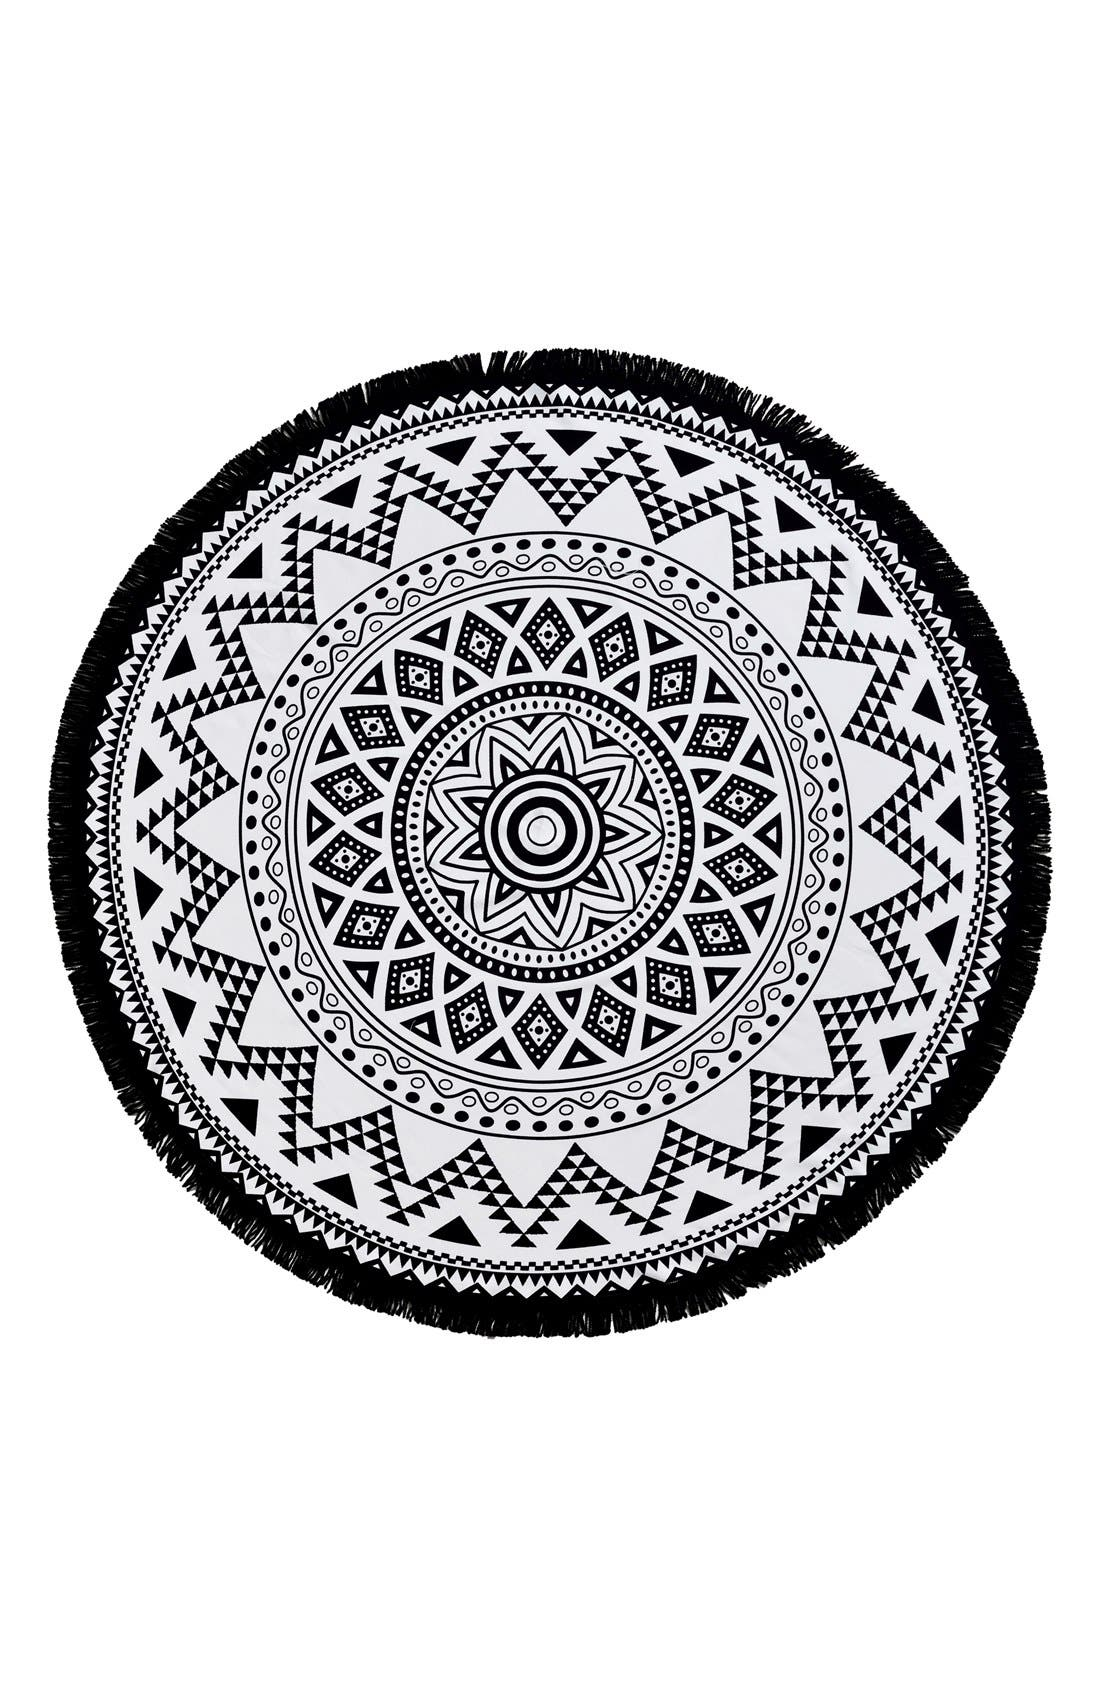 Alternate Image 1 Selected - Linum Home Textiles 'Kilim' Turkish Pestemal Round Beach Towel